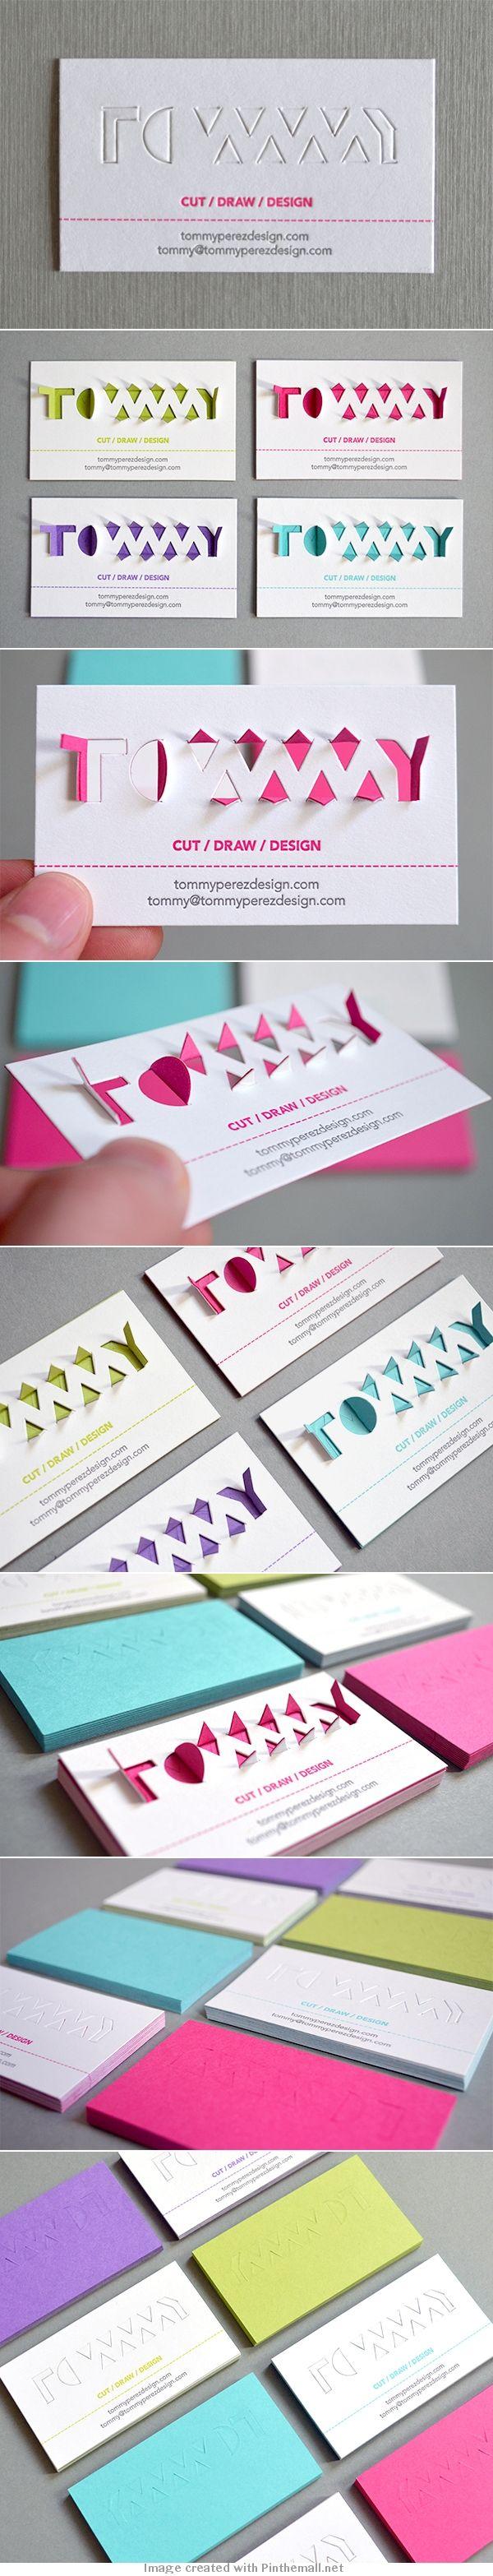 business card corporate branding die cut letterpress folding design